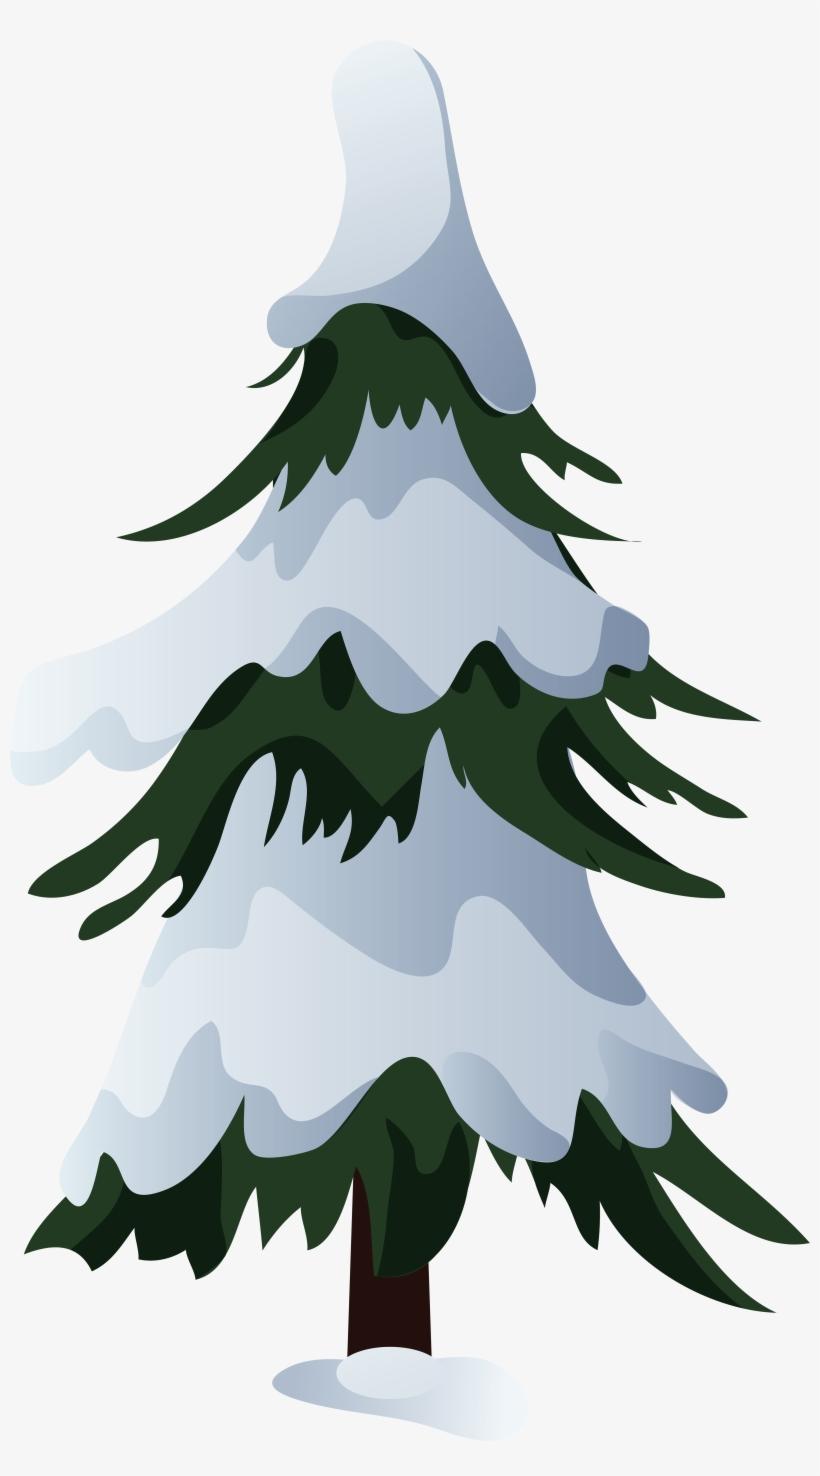 Snowy Pine Tree Png Clip Art.